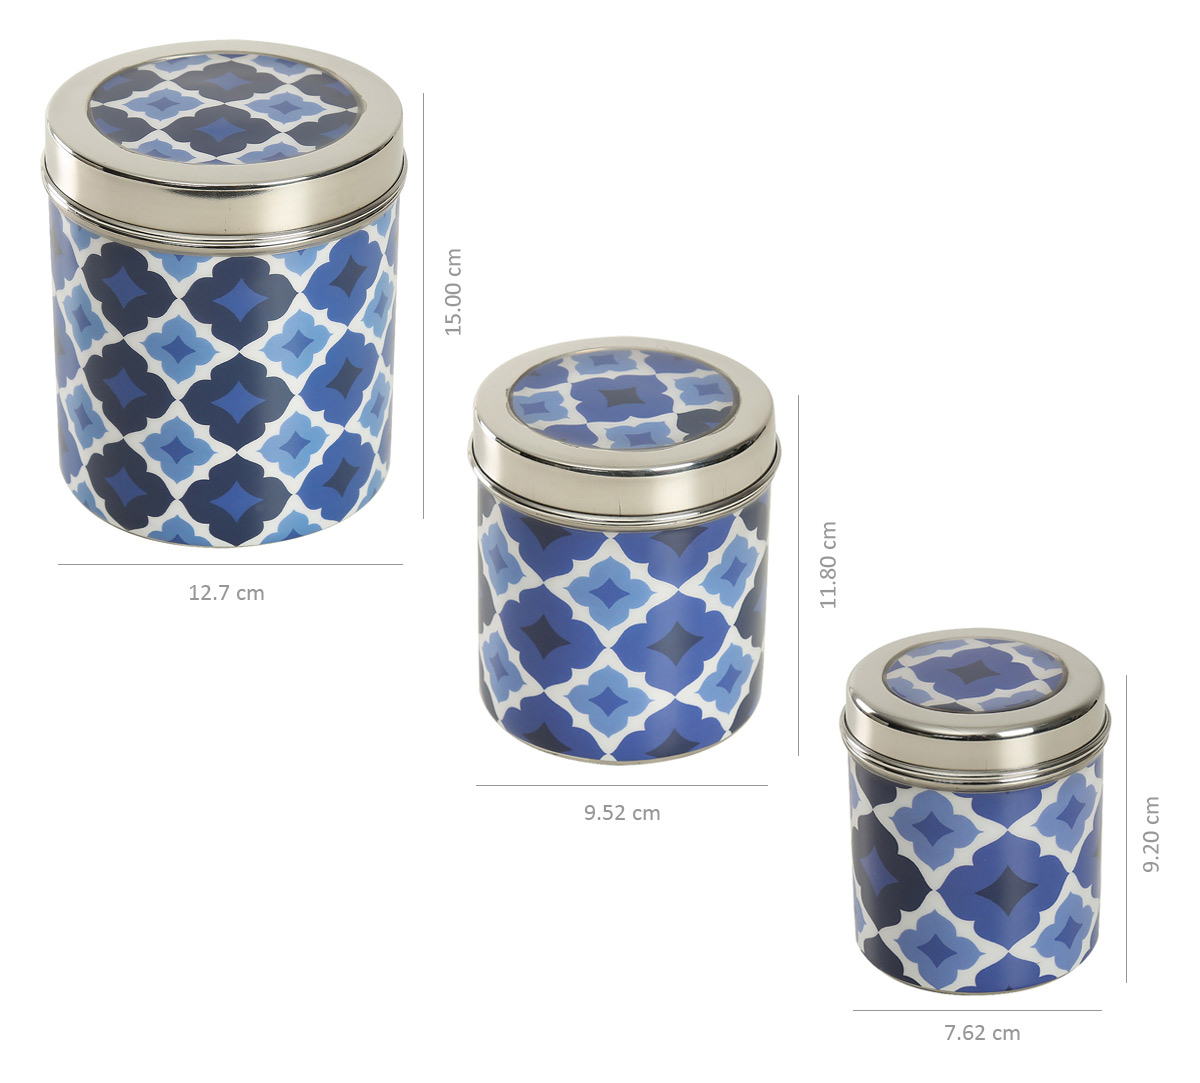 Prismatic Hexagons Steel Container (Set of 3)